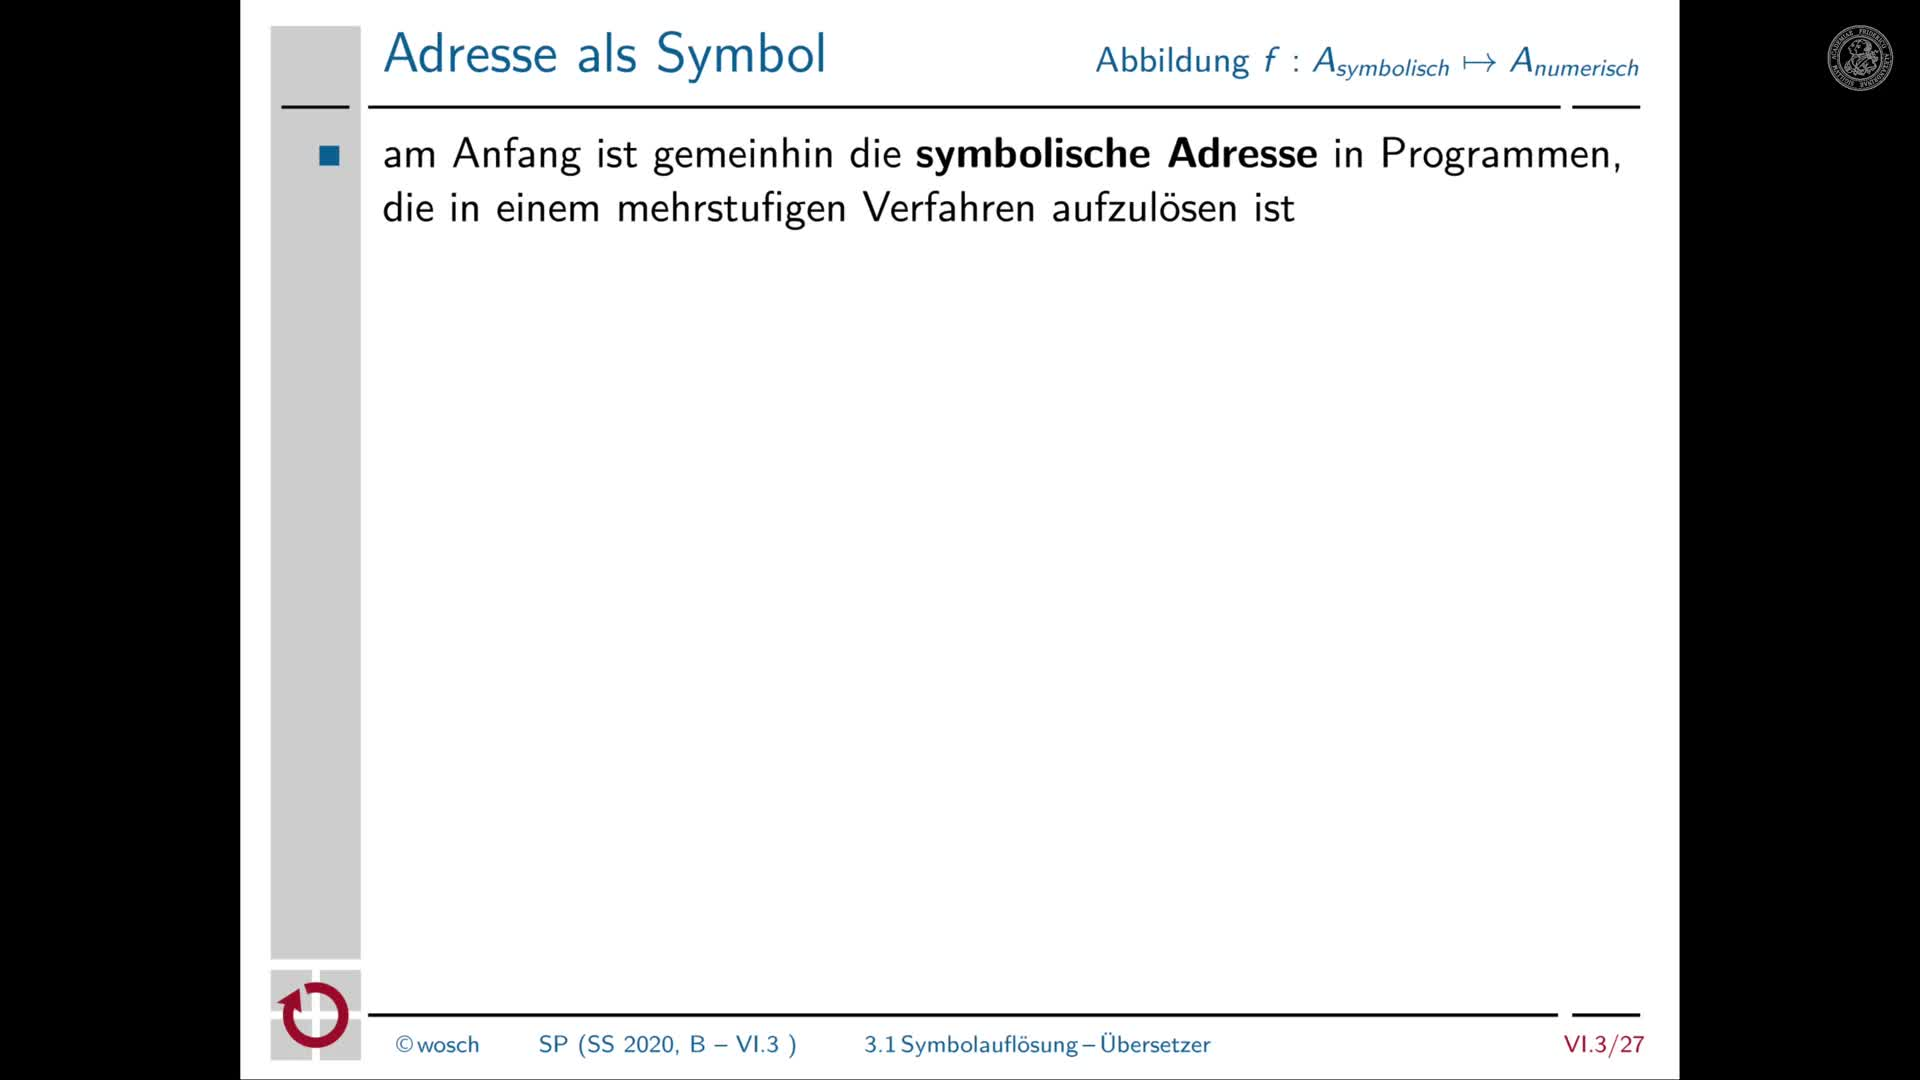 6.3.6 Adressbindung: Symbolauflösung preview image